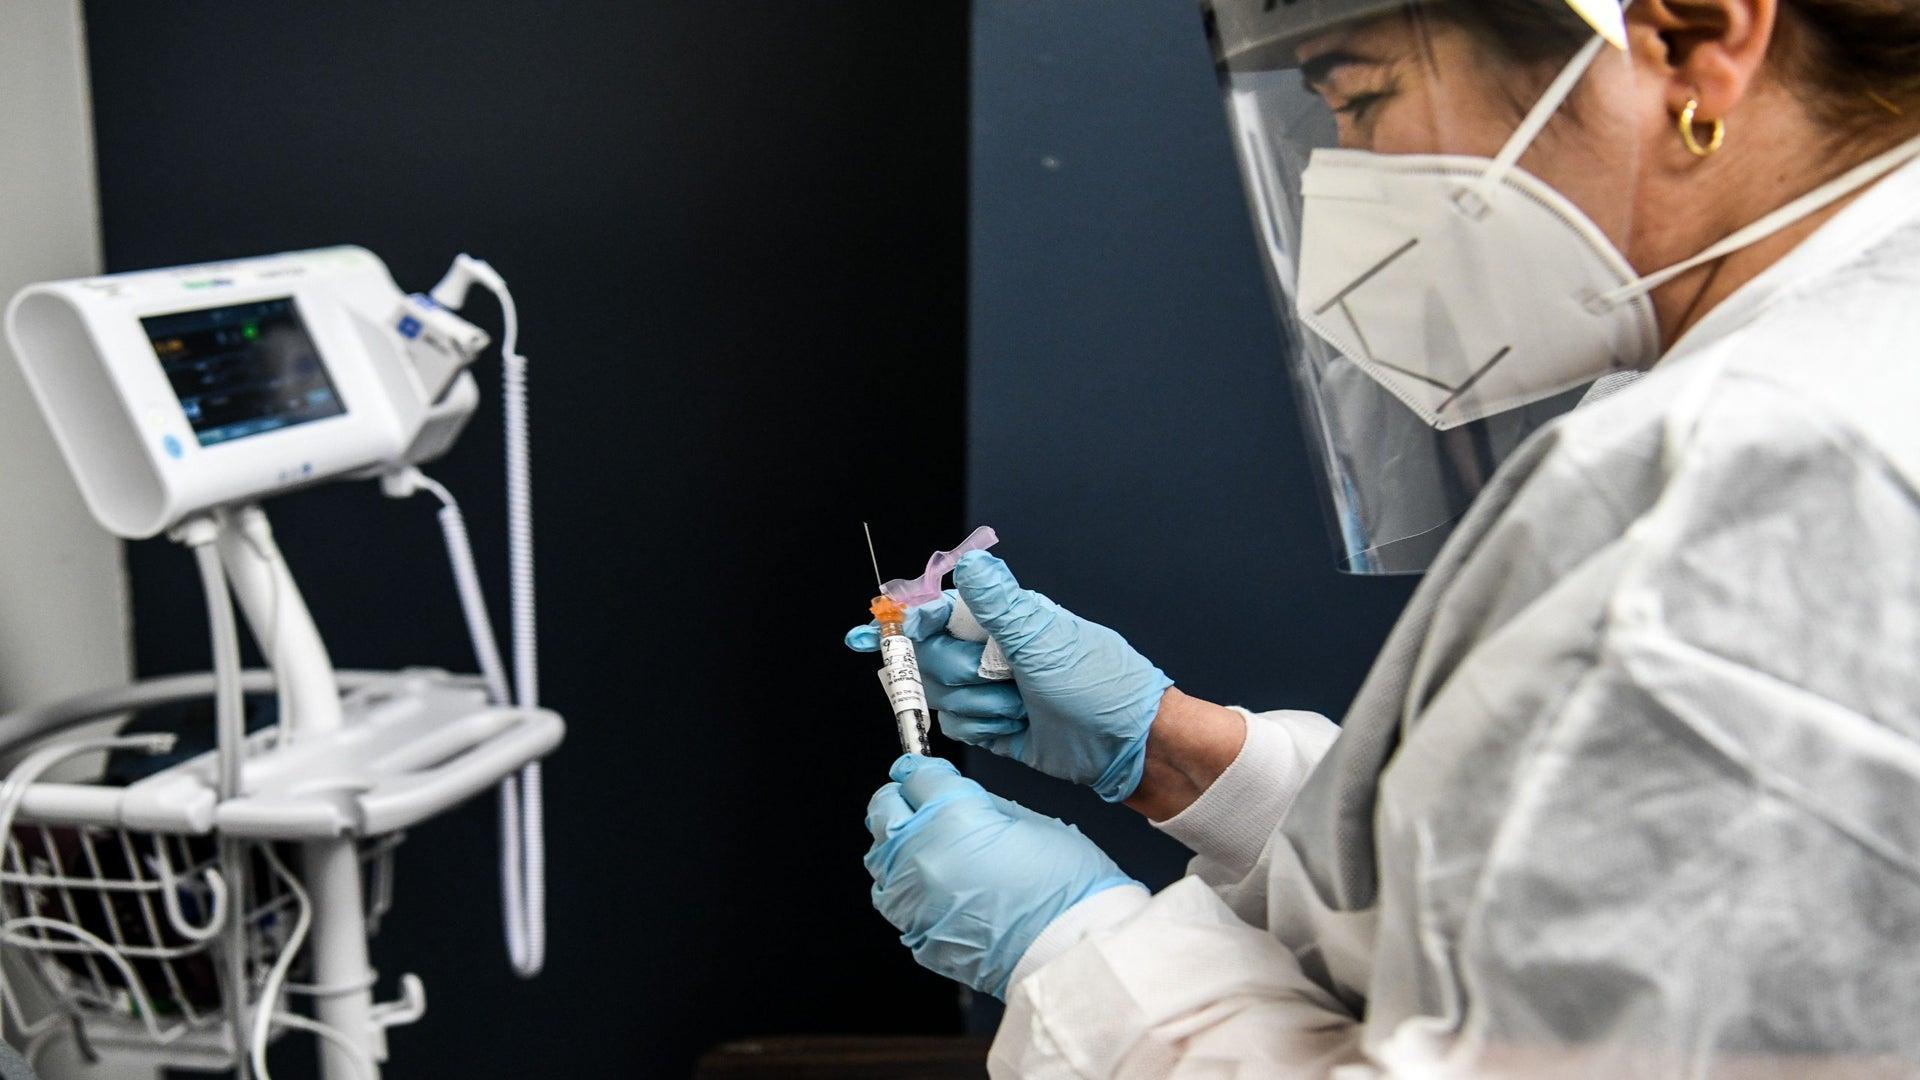 Black Healthcare Providers Organize To Build Trustworthiness Of COVID-19 Vaccine Process